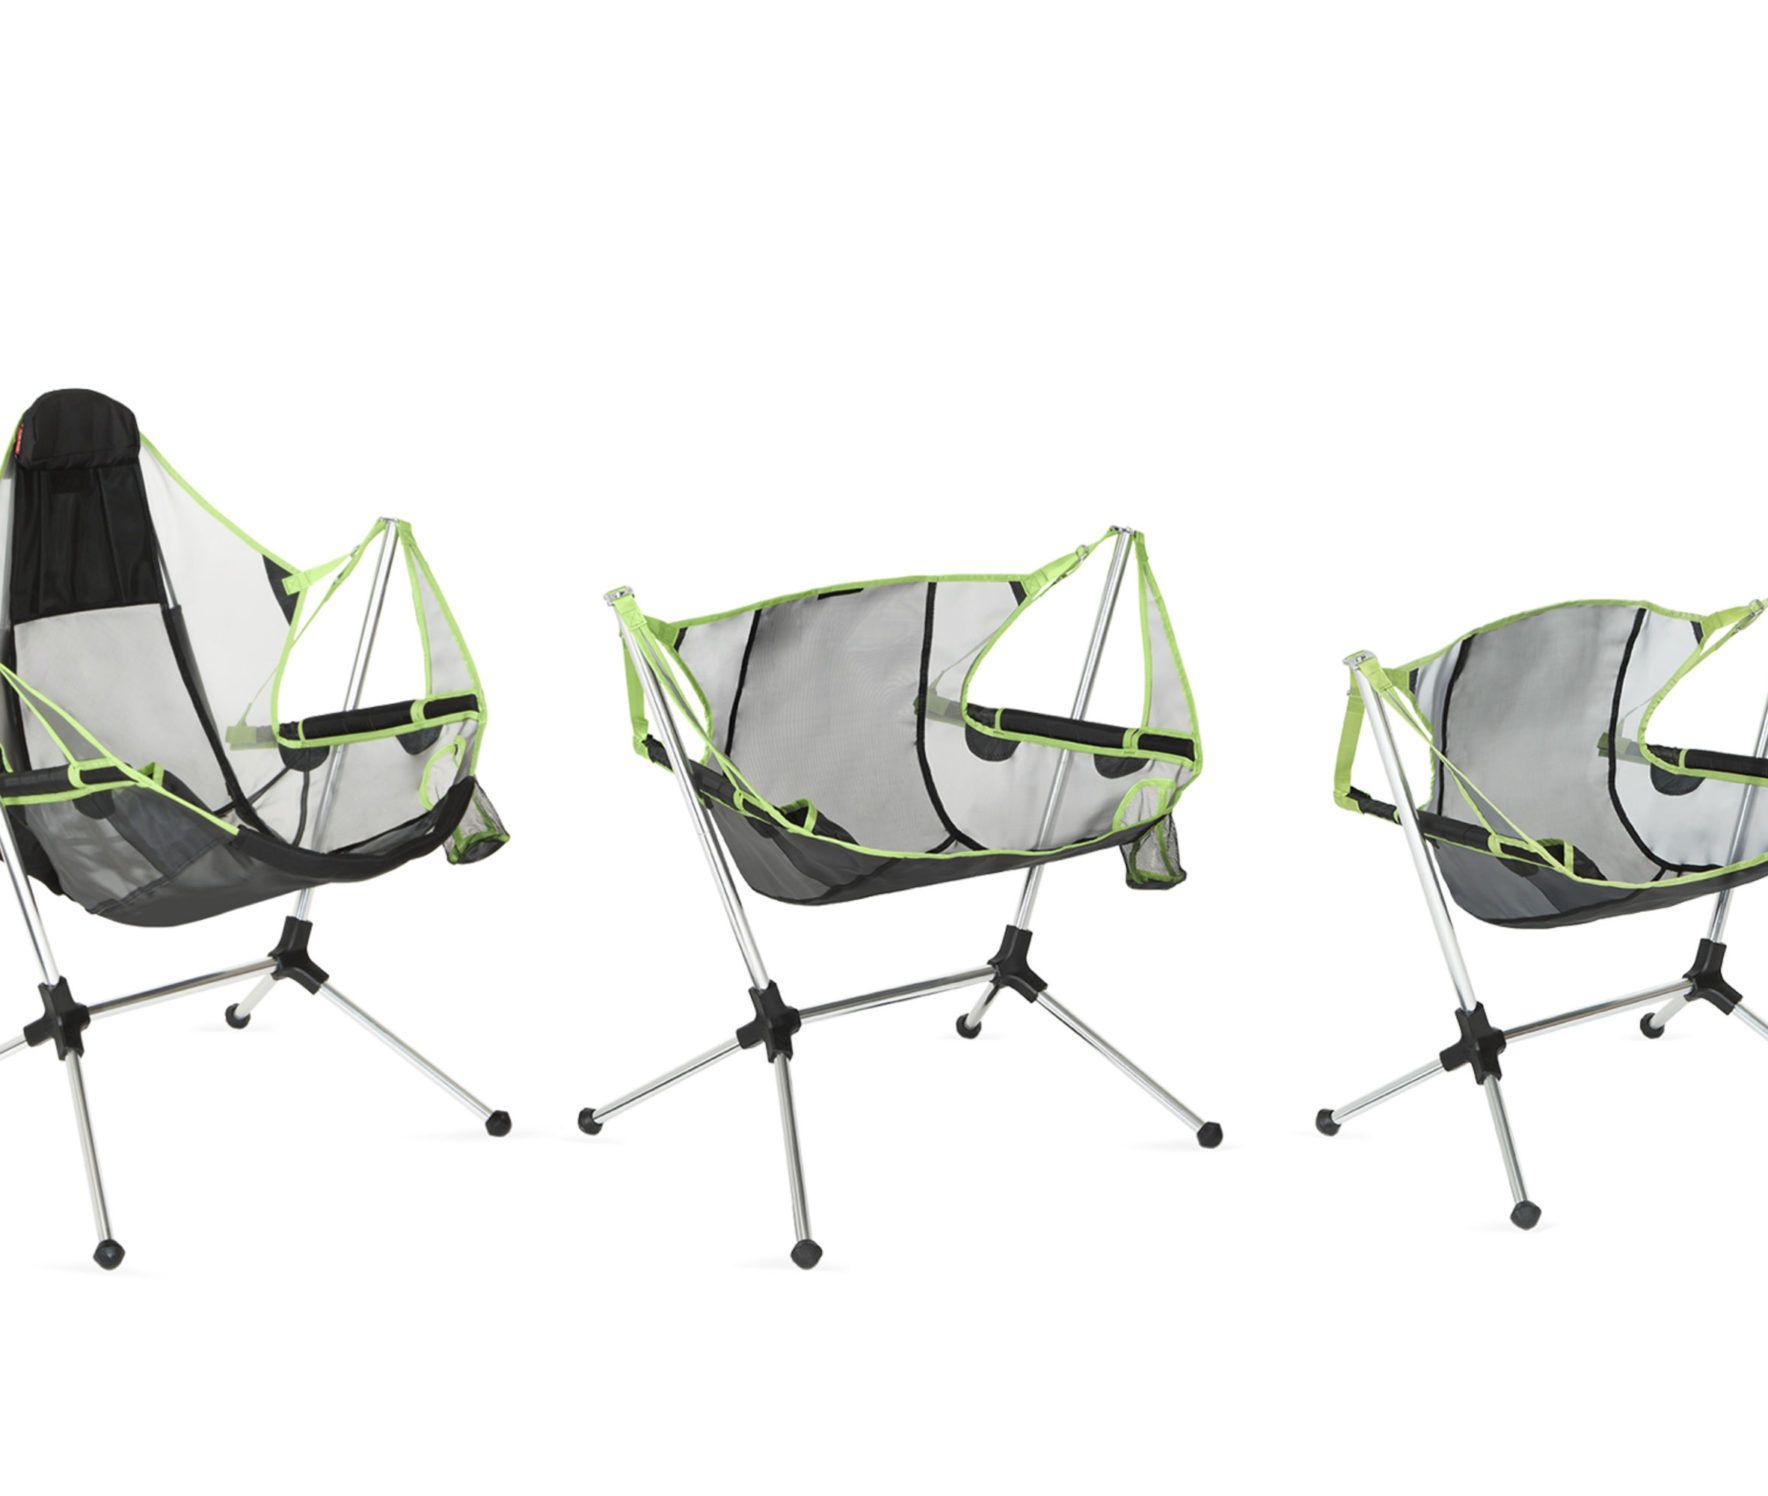 Stargaze™ Recliner Luxury Chair Luxury chairs, Luxury